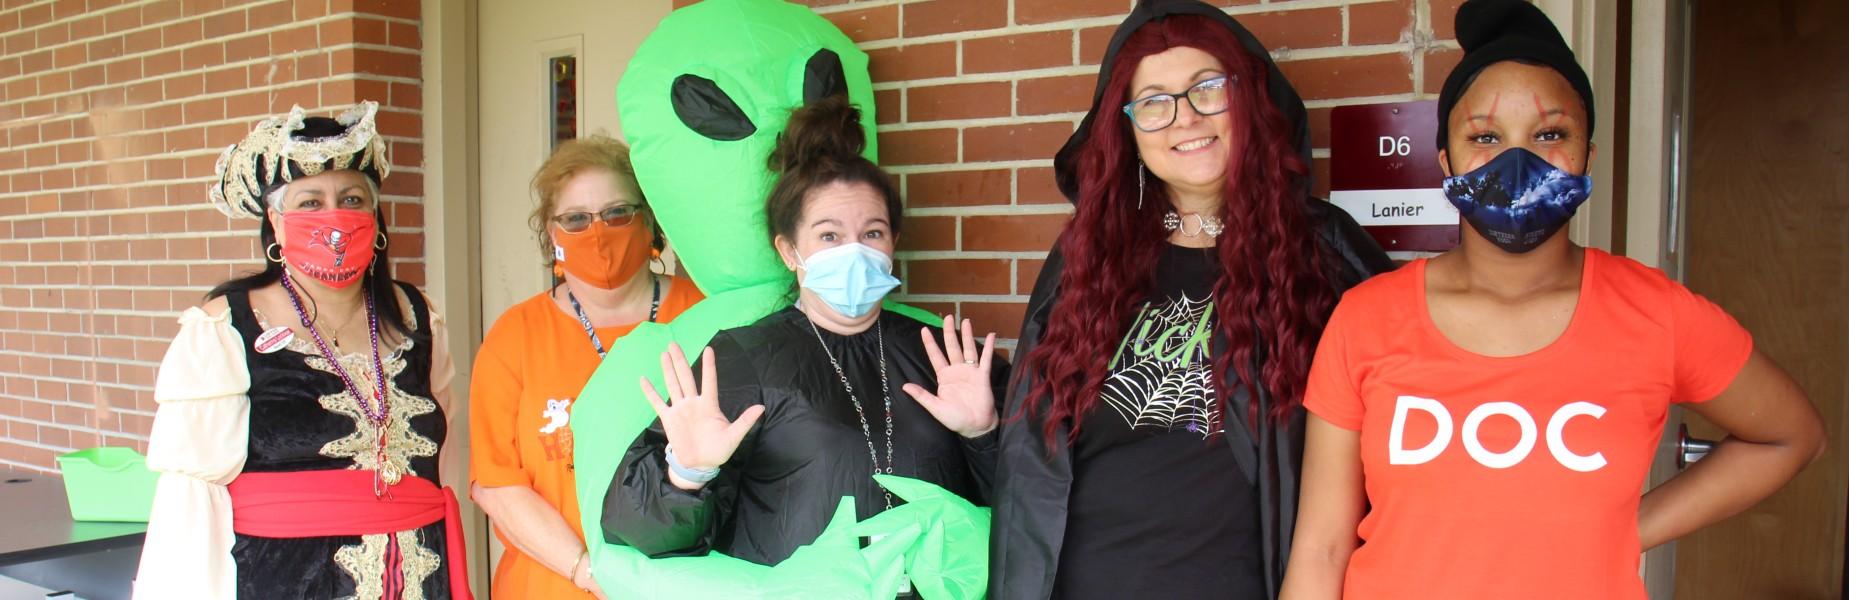 Teachers dressed up for Halloween